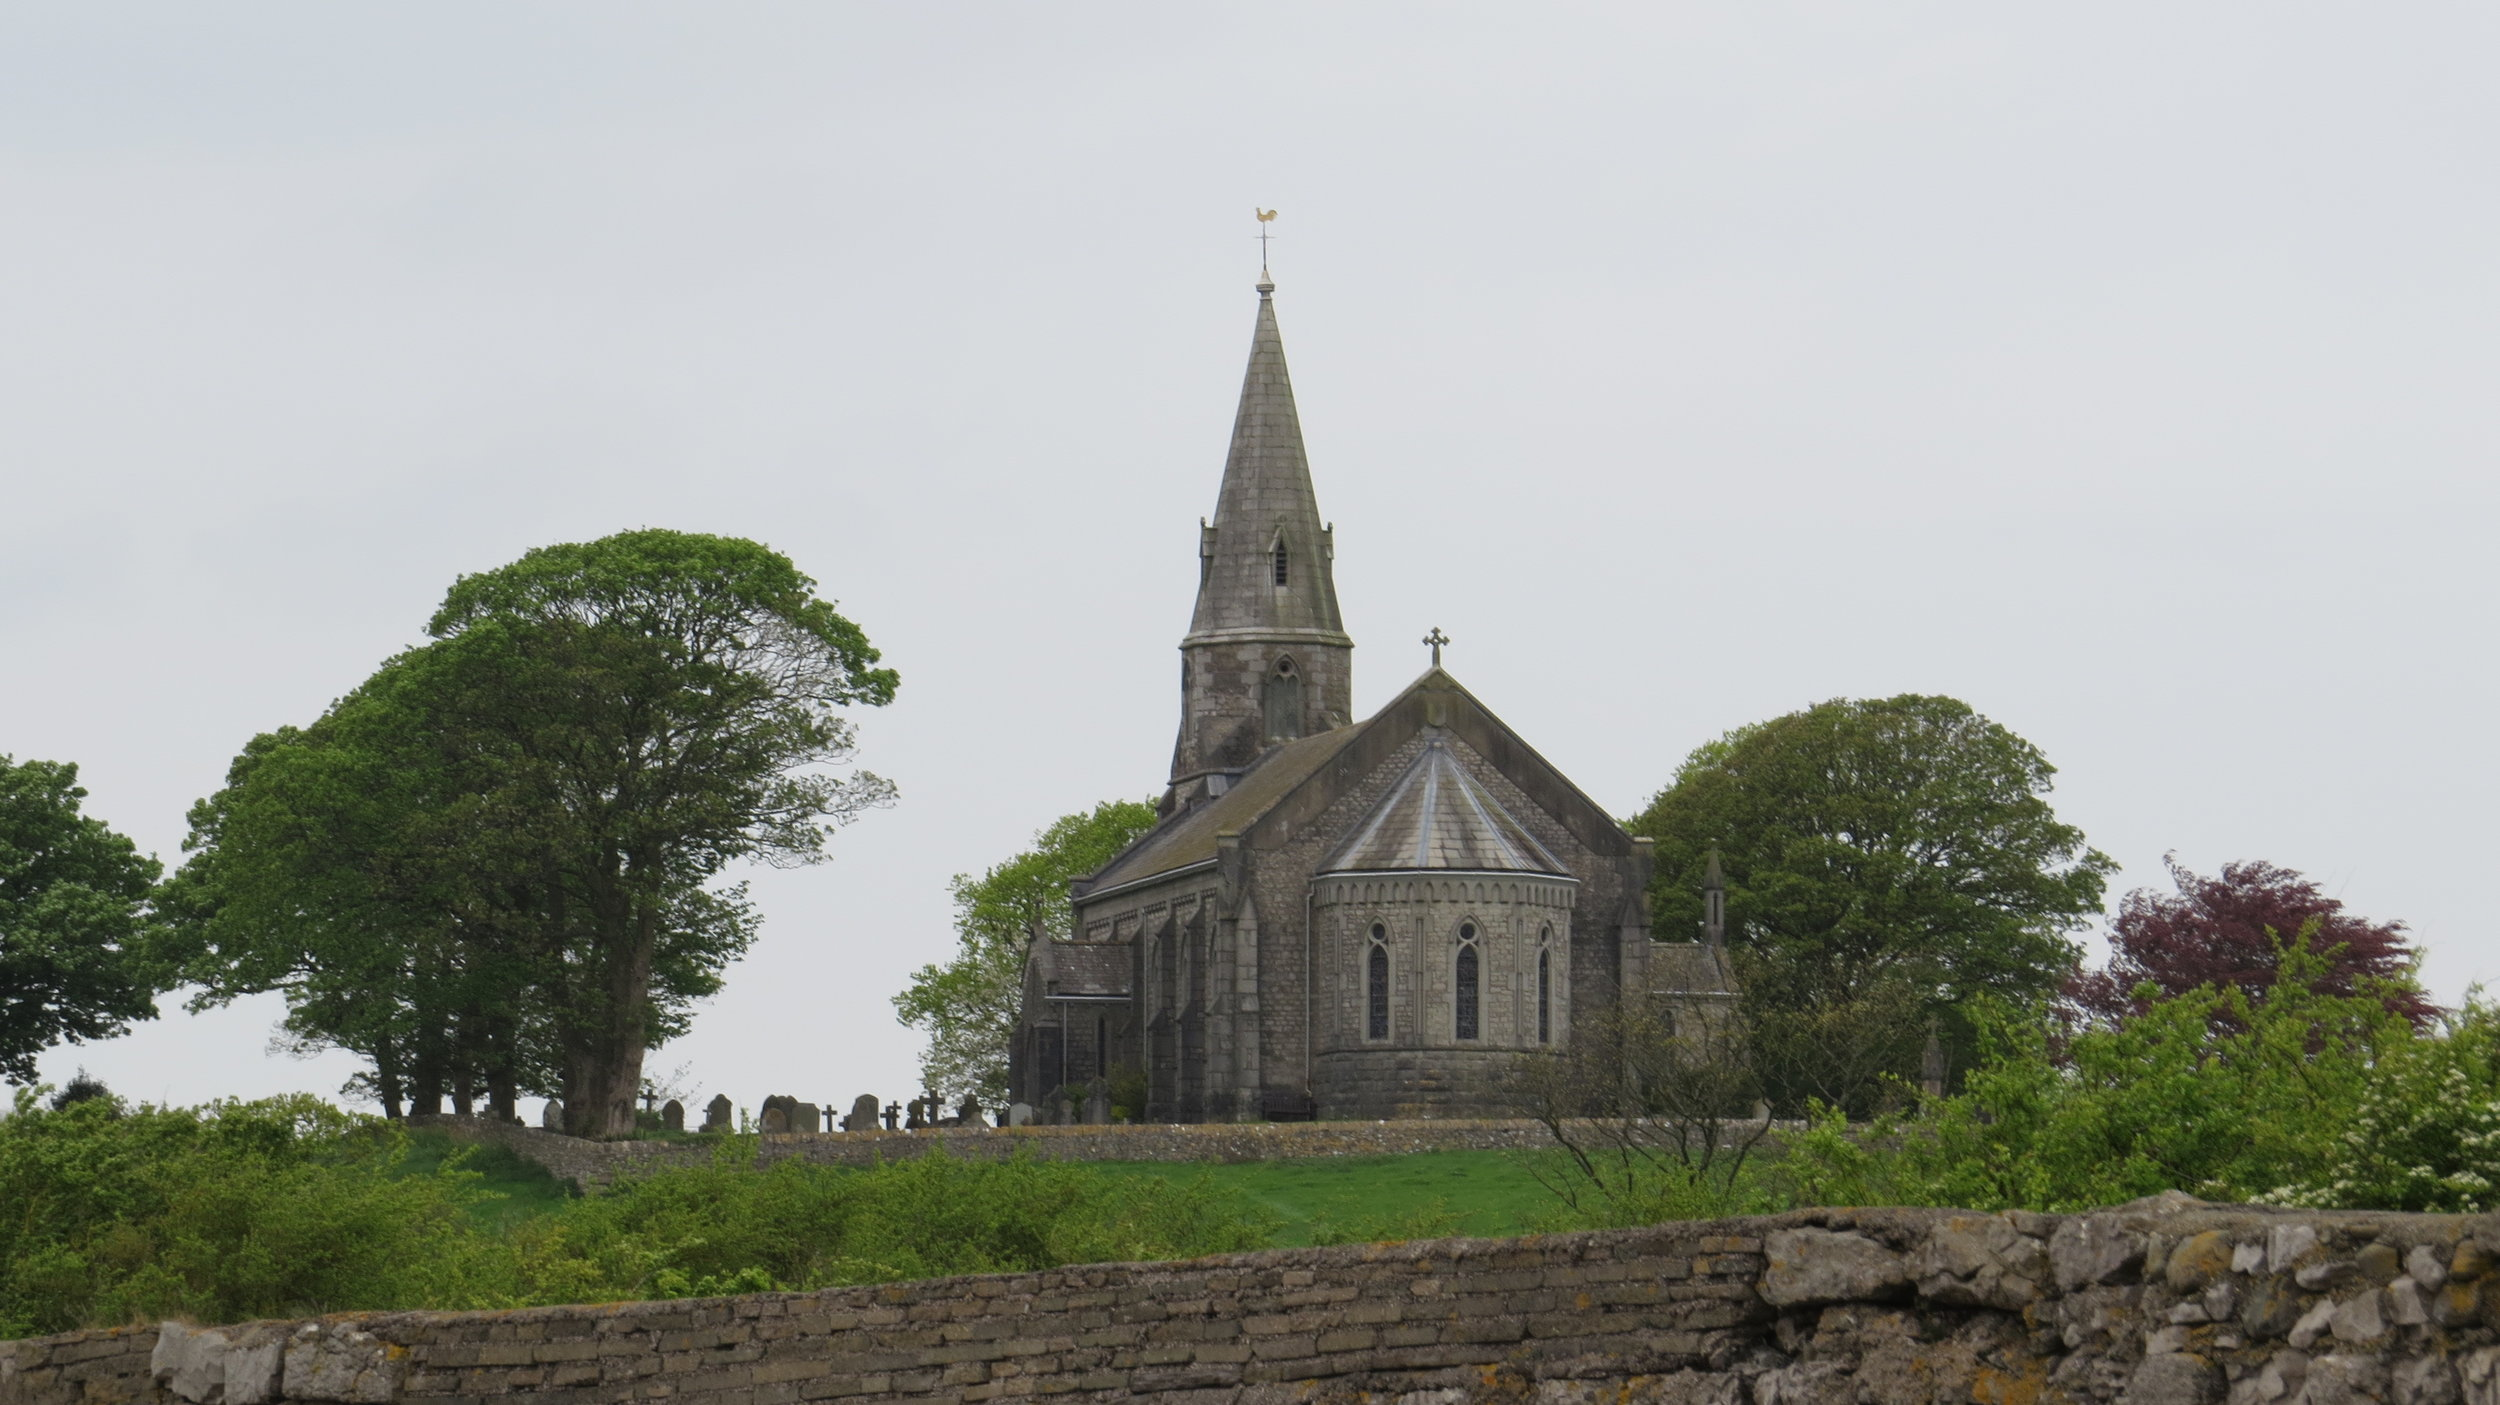 Bardsea Church